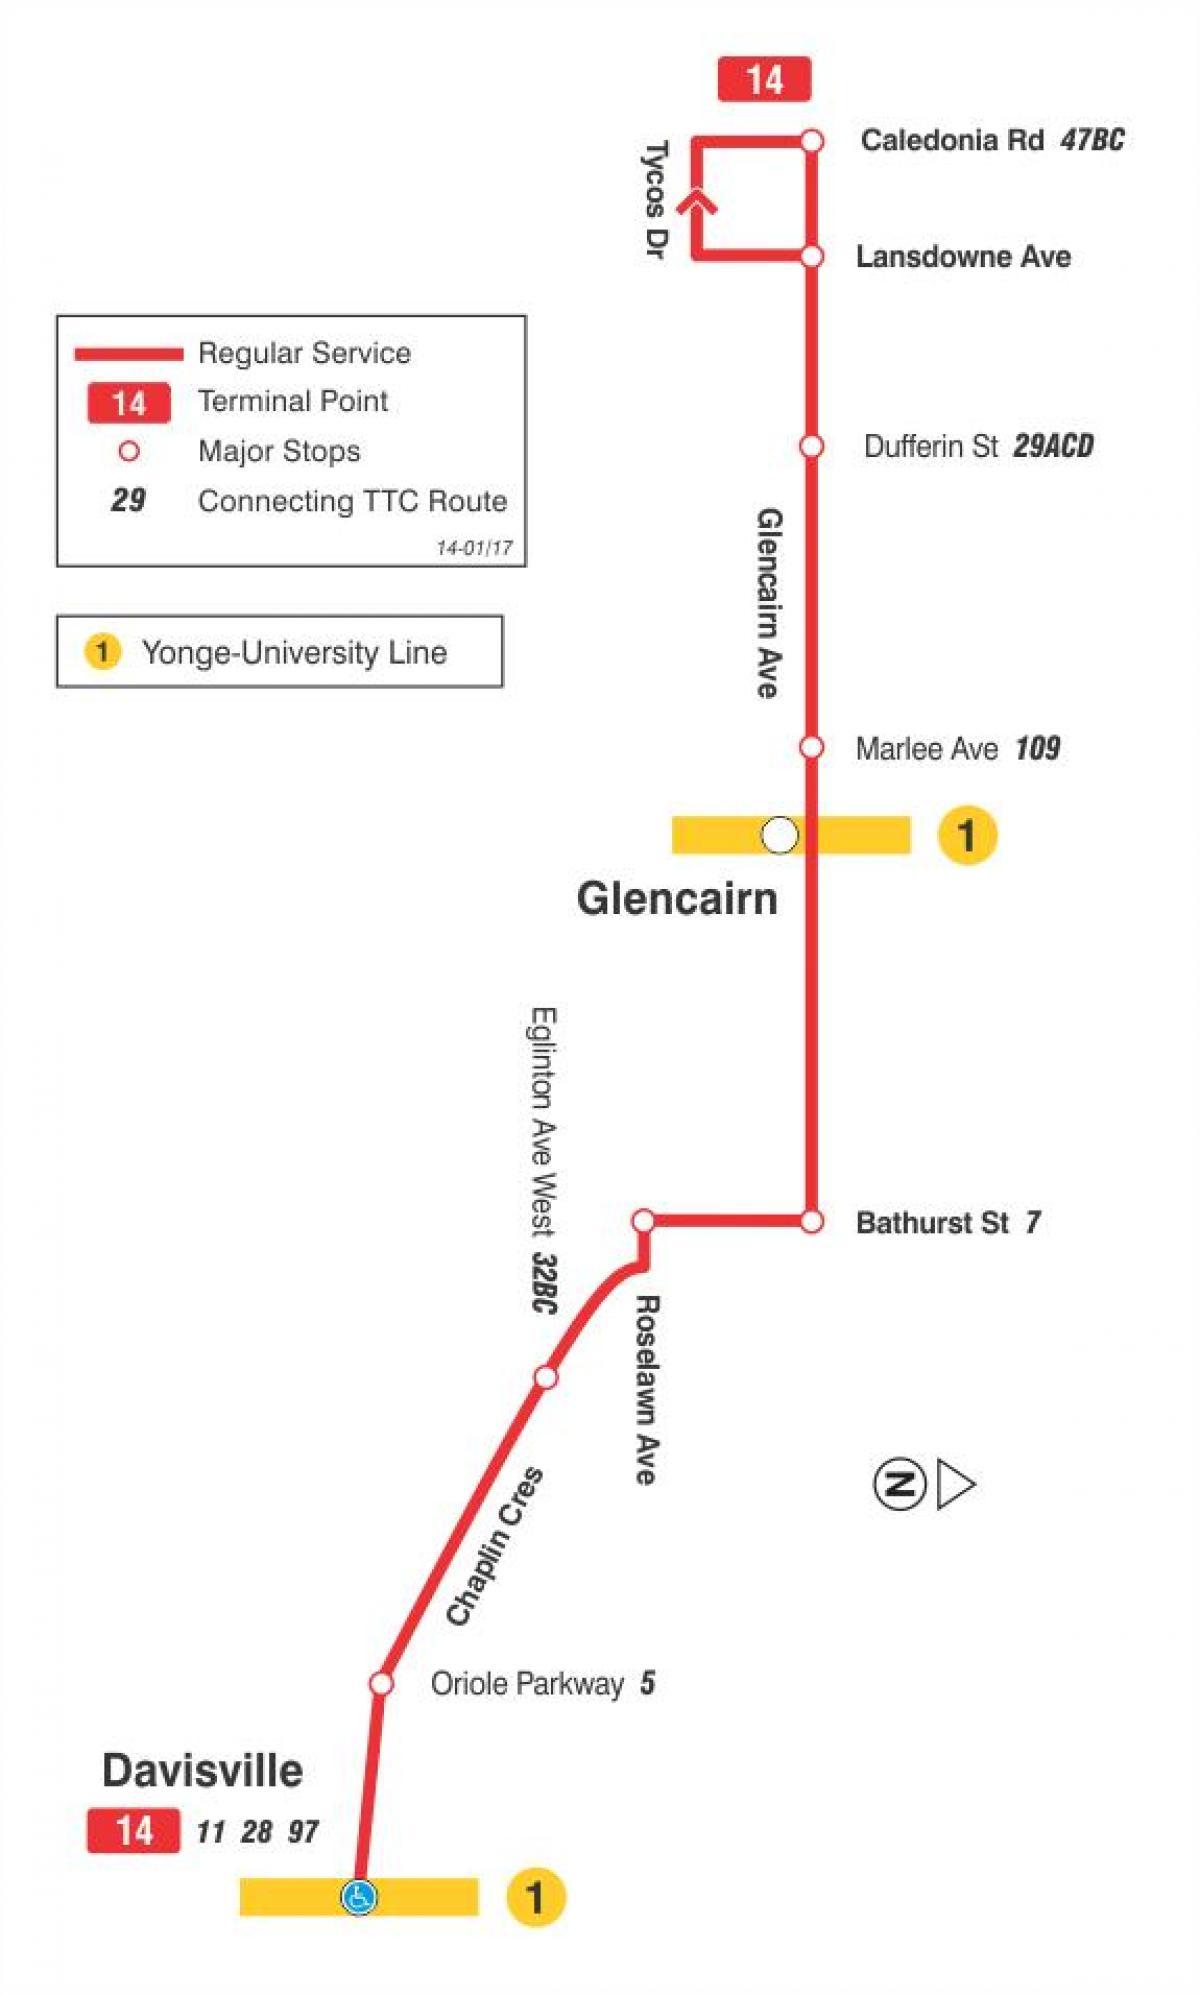 kart rute TTC 14 Glencairn buss rute Toronto kart   Kart over TTC 14  kart rute